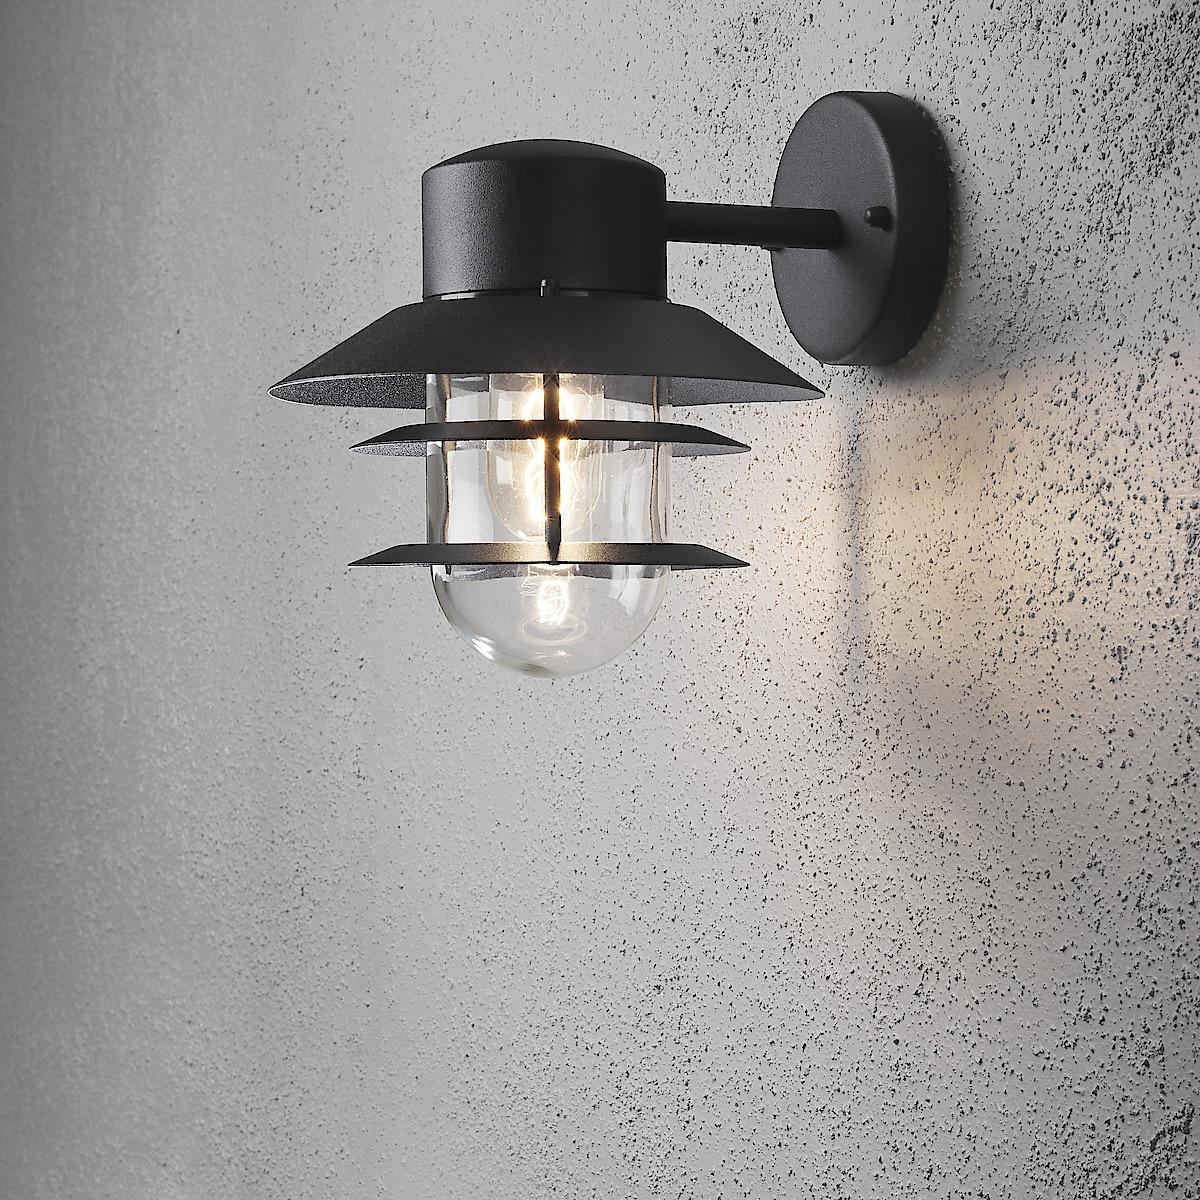 Utomhusbelysning Modena Konstsmide